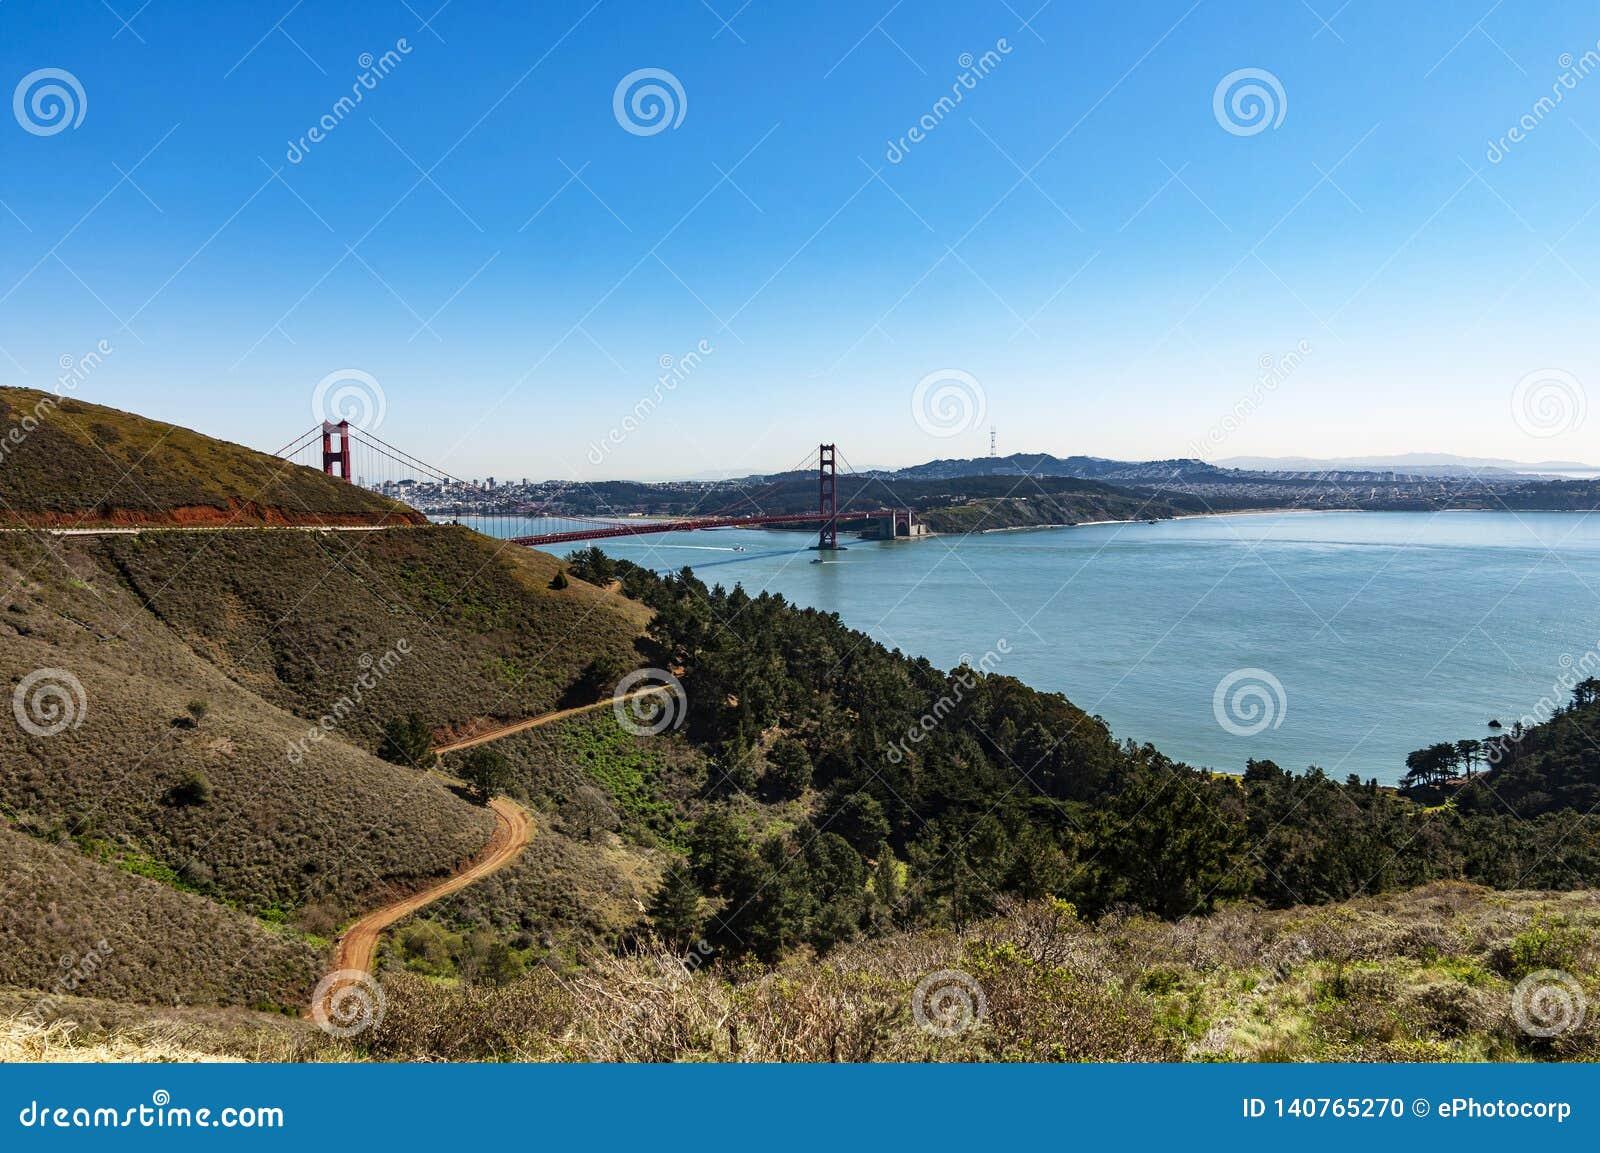 Golden Gate bridge, San Francisco, United States Of America